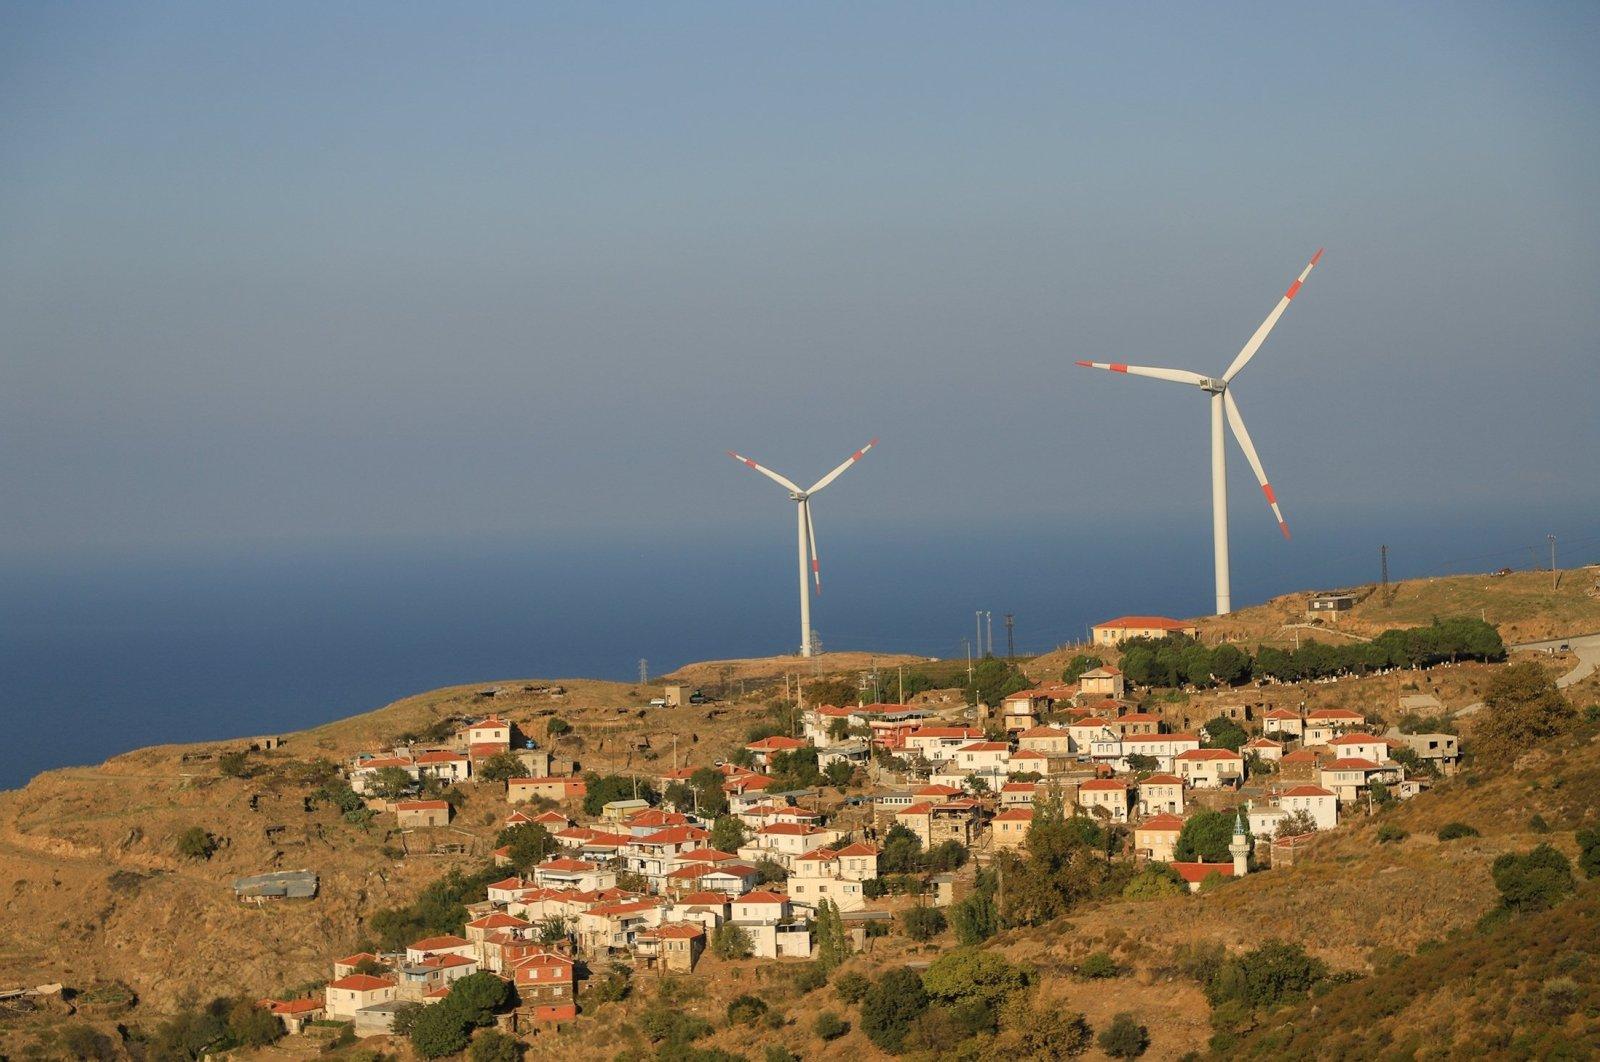 Wind turbines are seen in the Karaburun district of Turkey's Aegean province of Izmir, April 30, 2021. (Shutterstock Photo)